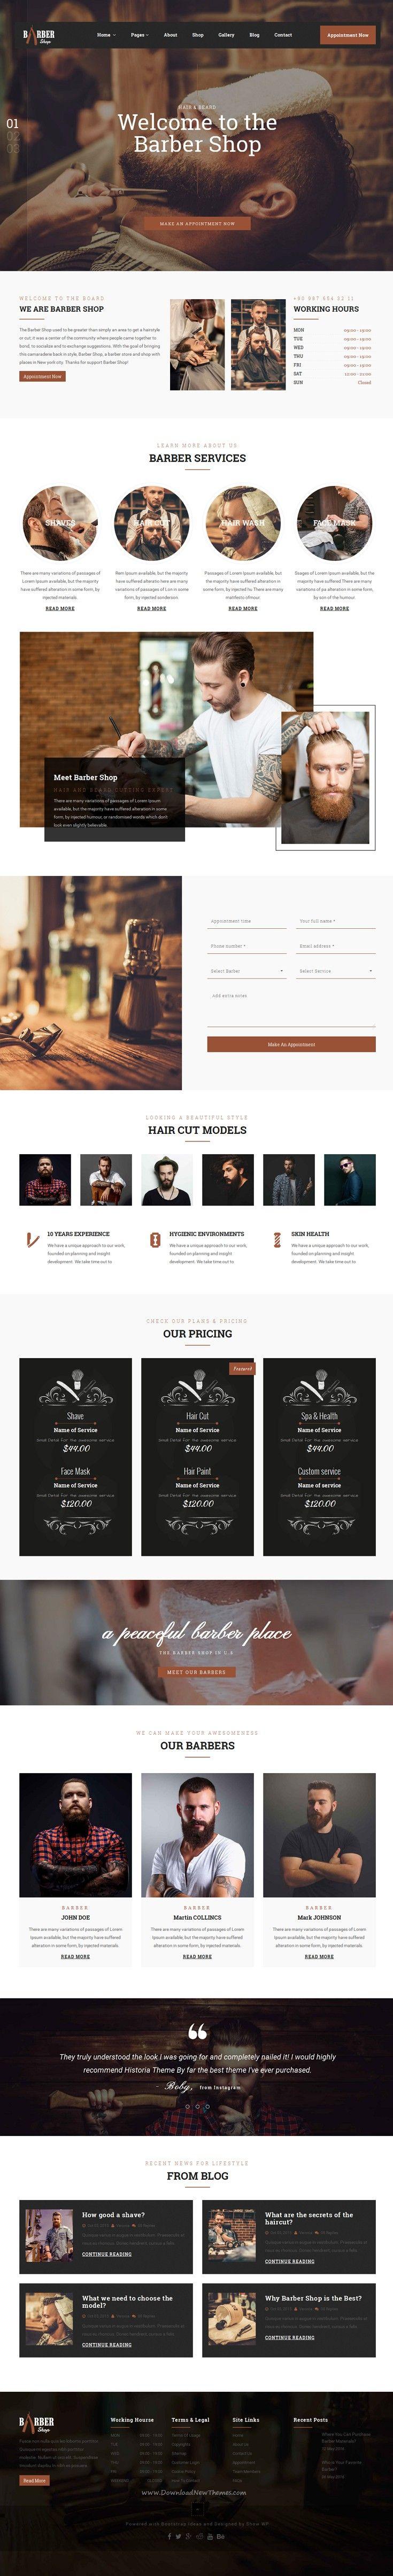 the barber shop is a bootstrap html template design for. Black Bedroom Furniture Sets. Home Design Ideas